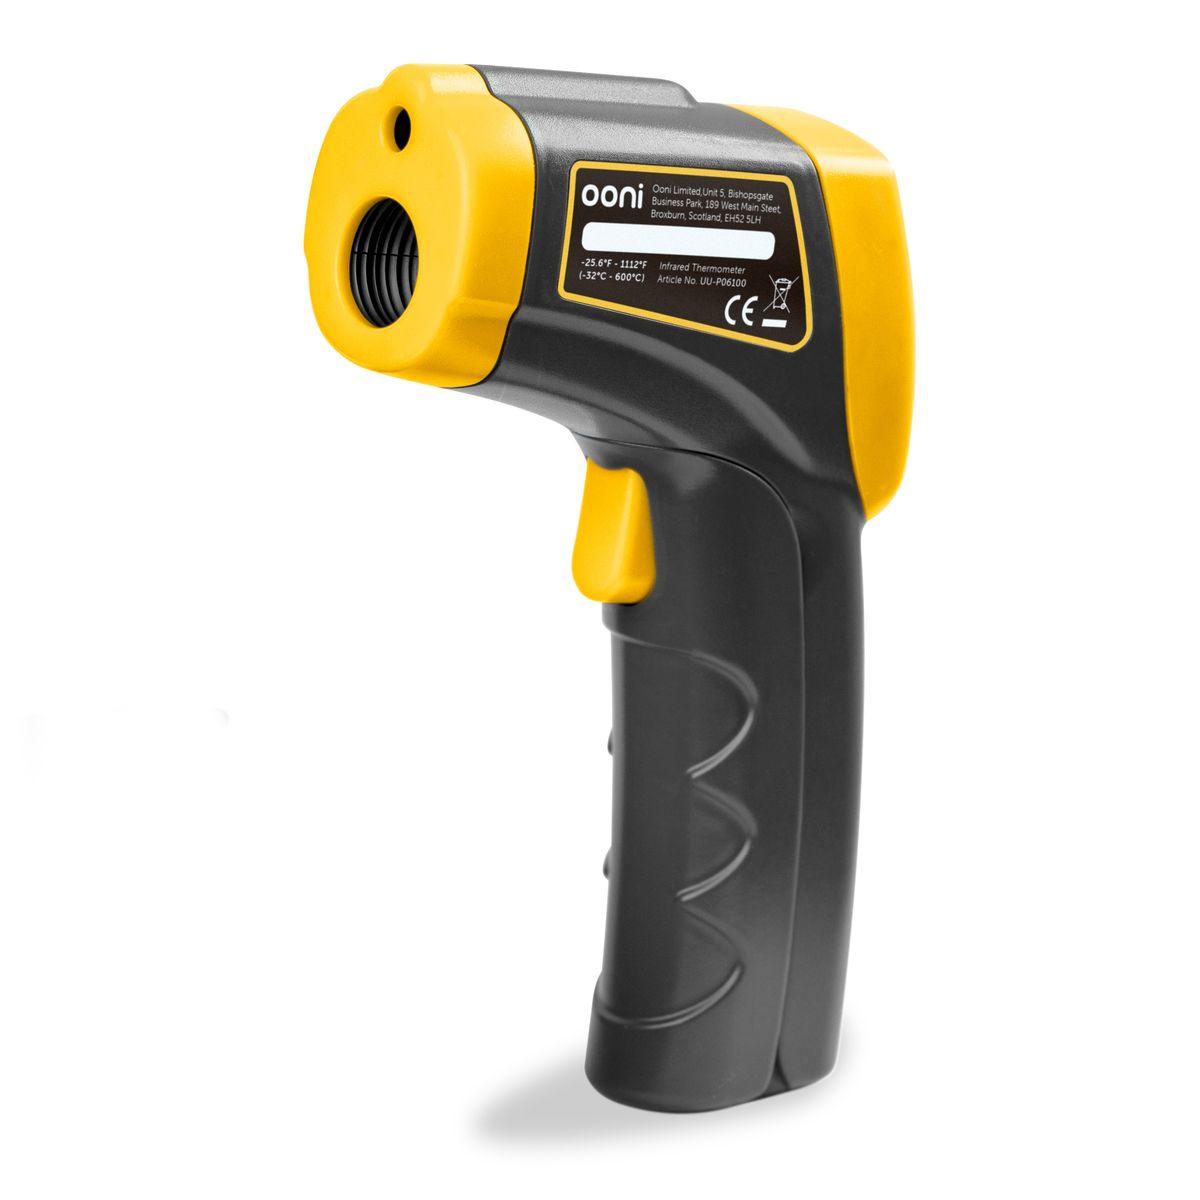 Thermomètre à infrarouge - Ooni